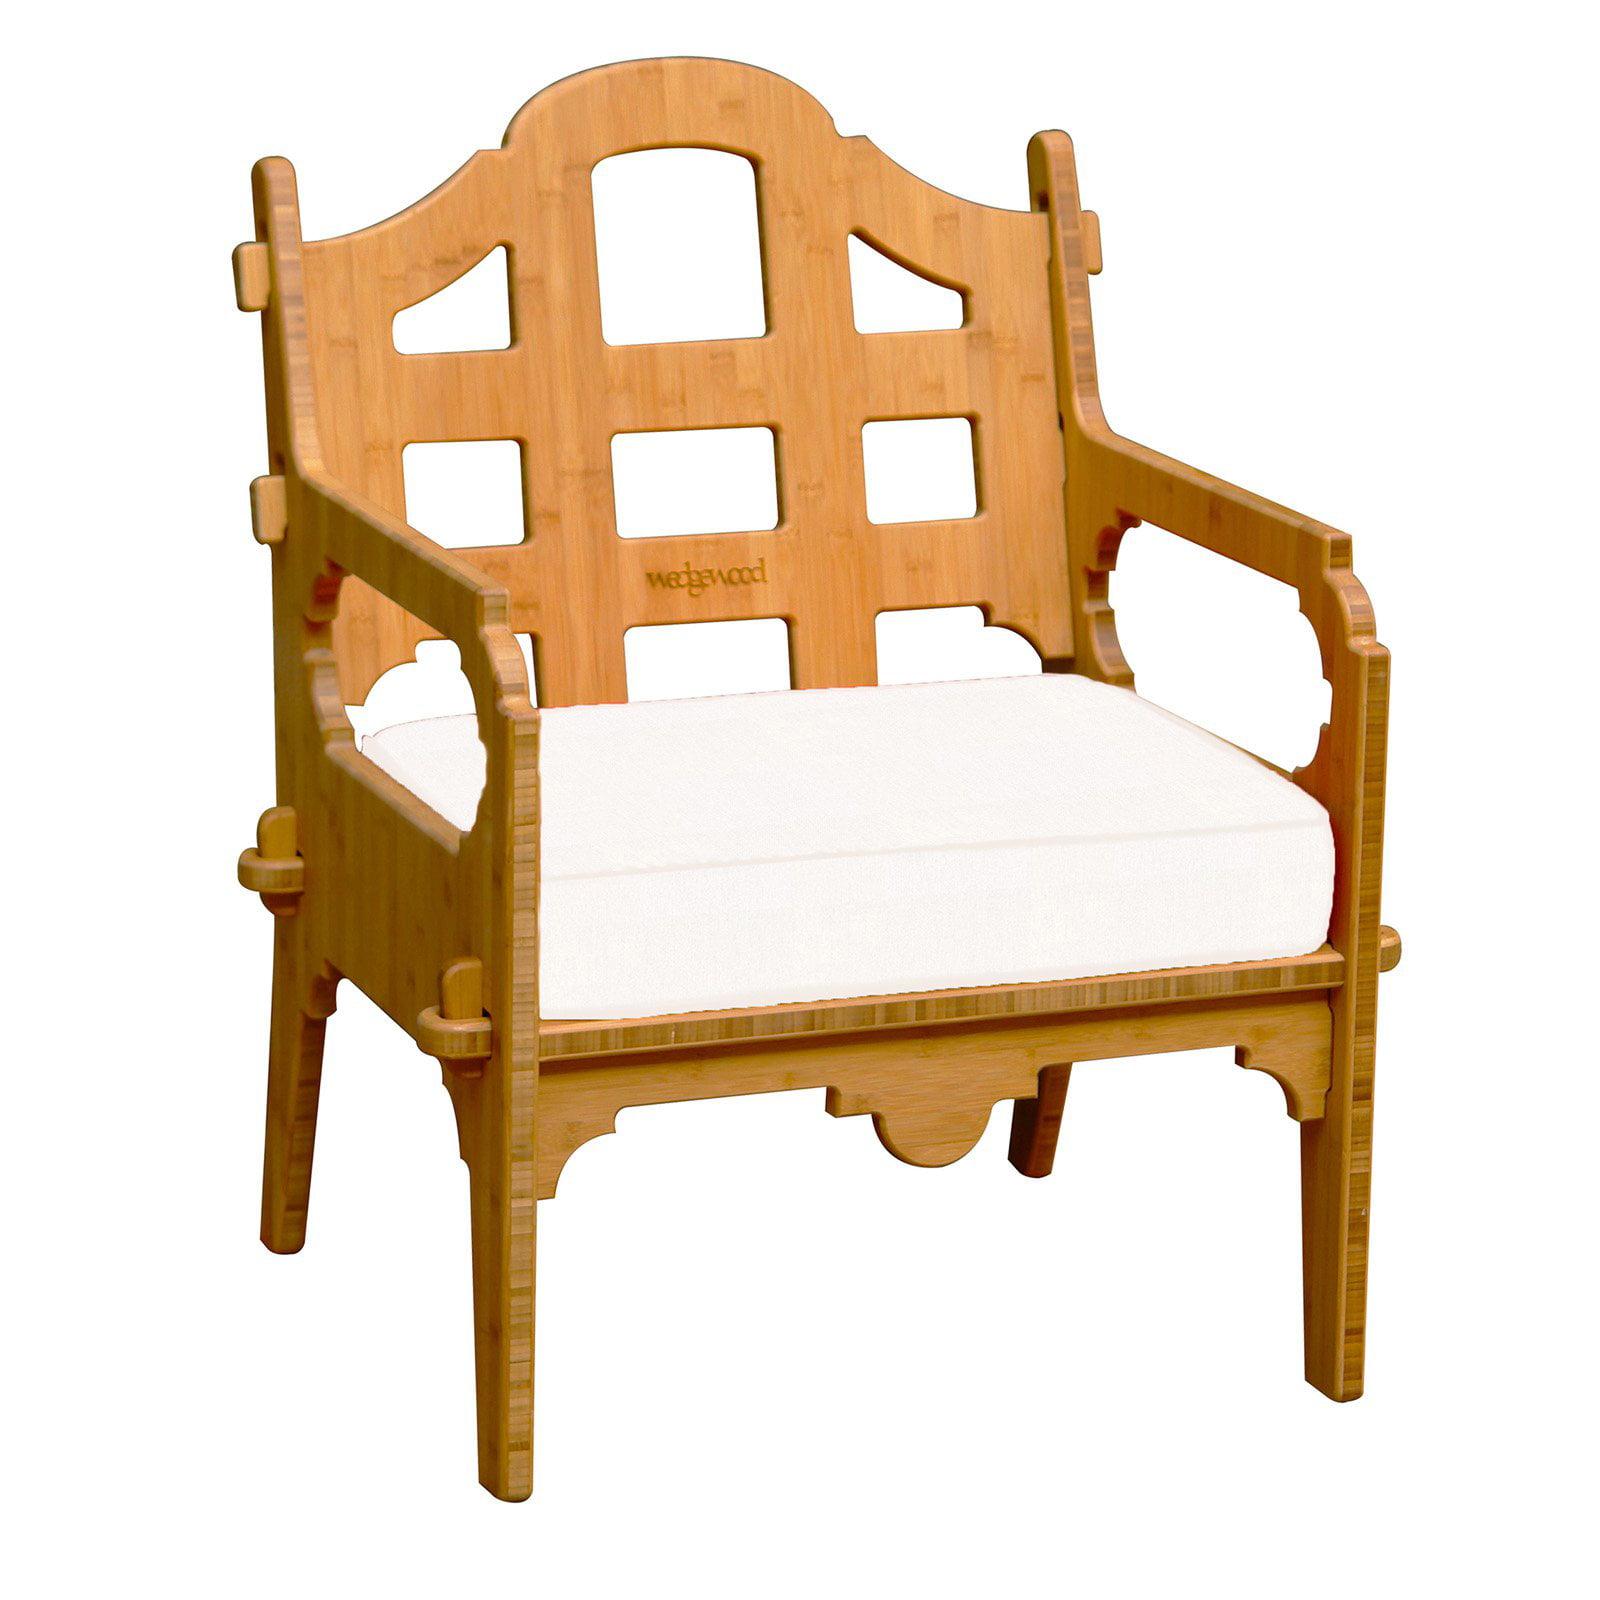 Wedgewood Furniture Palladian Outdoor Lounge Chair